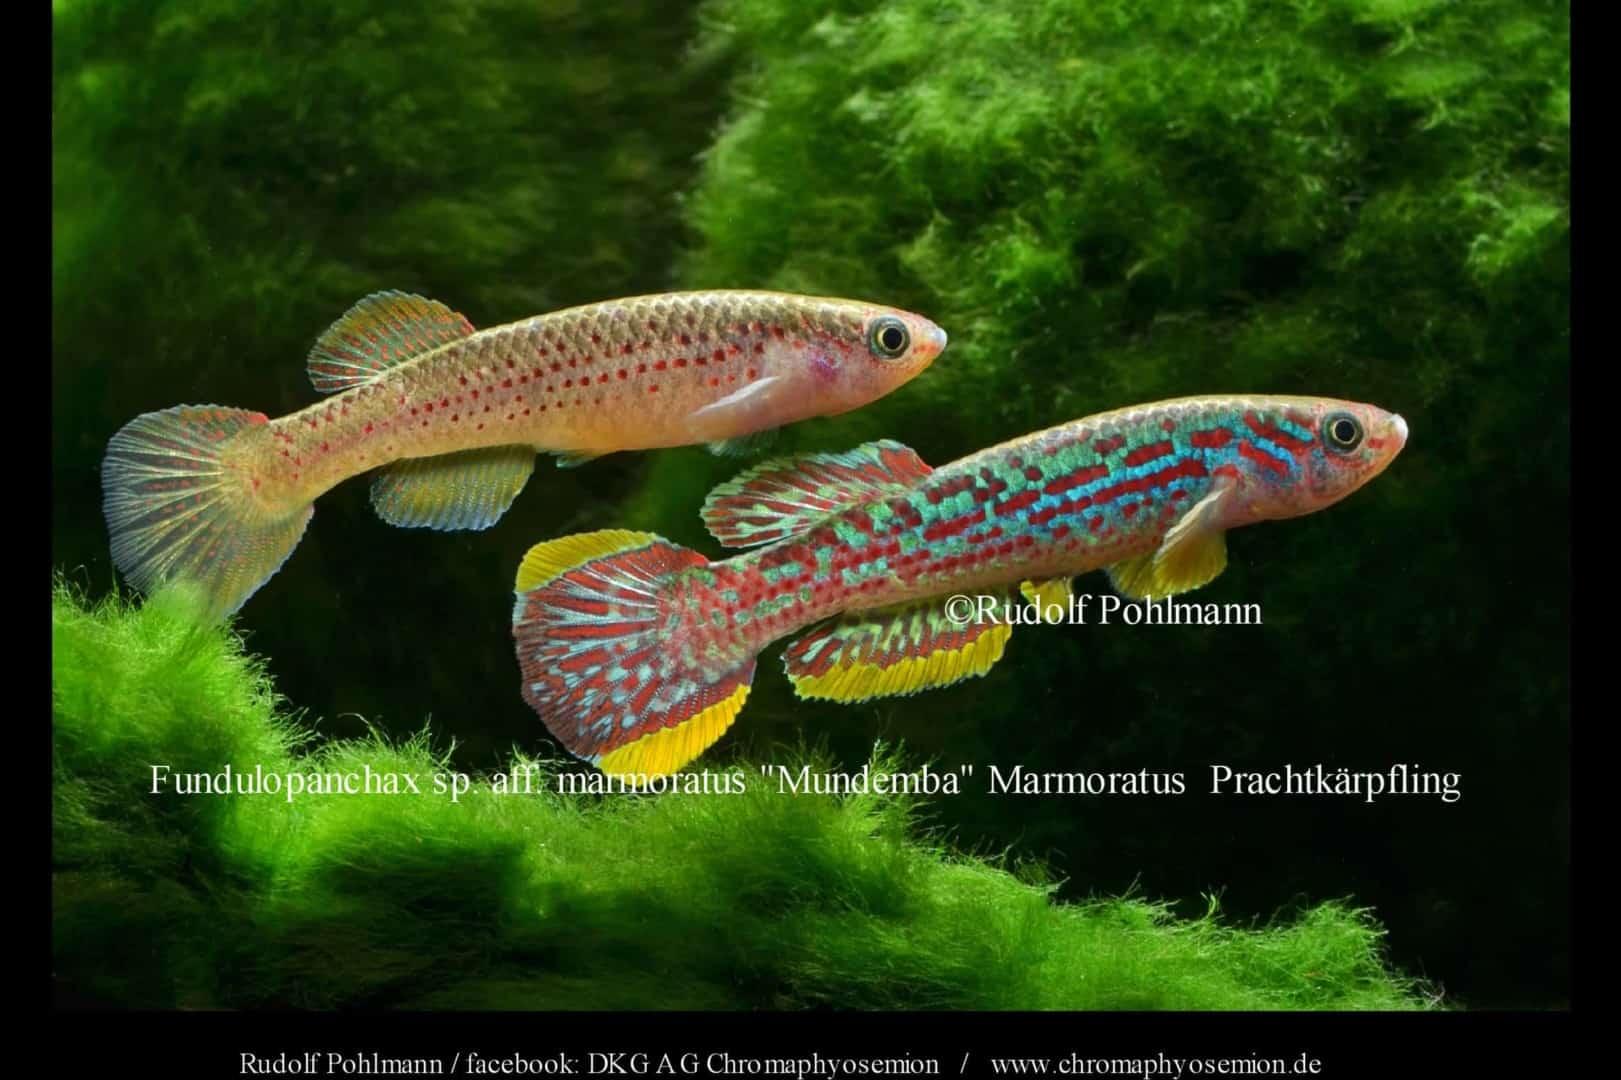 Fundulopanchax marmoratus – Marmoratus Prachtkärpfling 2